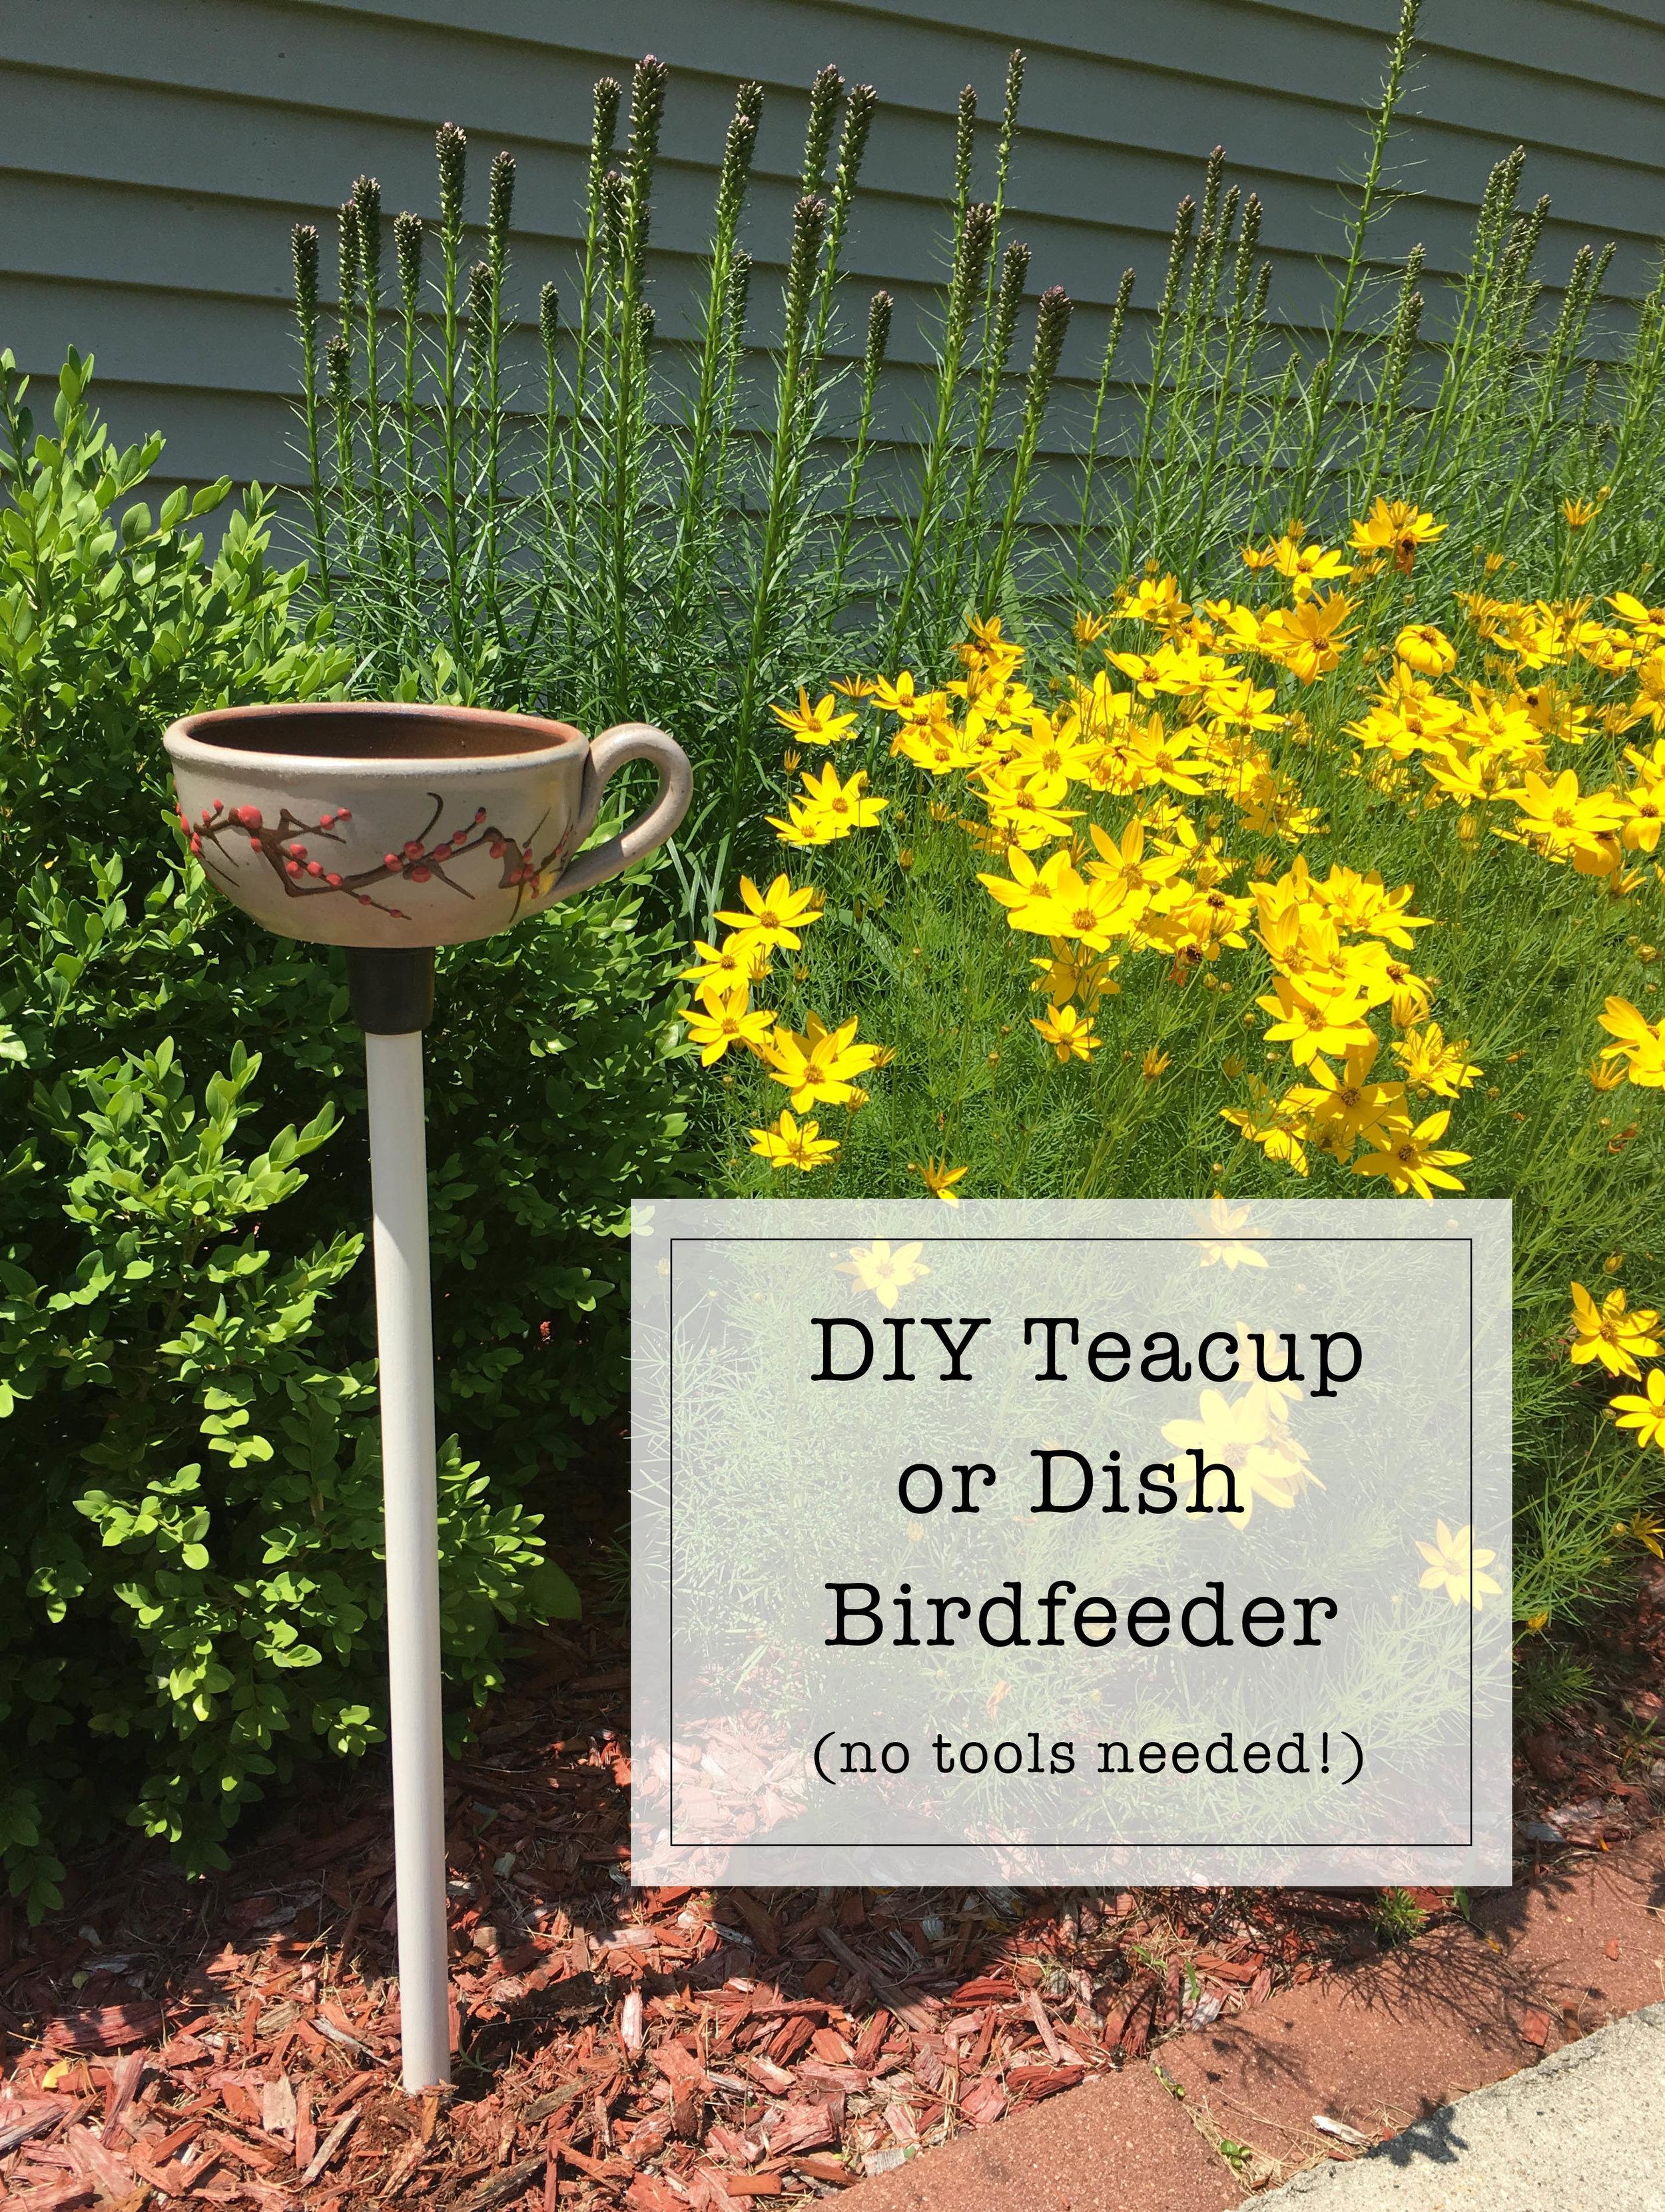 DIY Teacup or Dish Bird Feeder